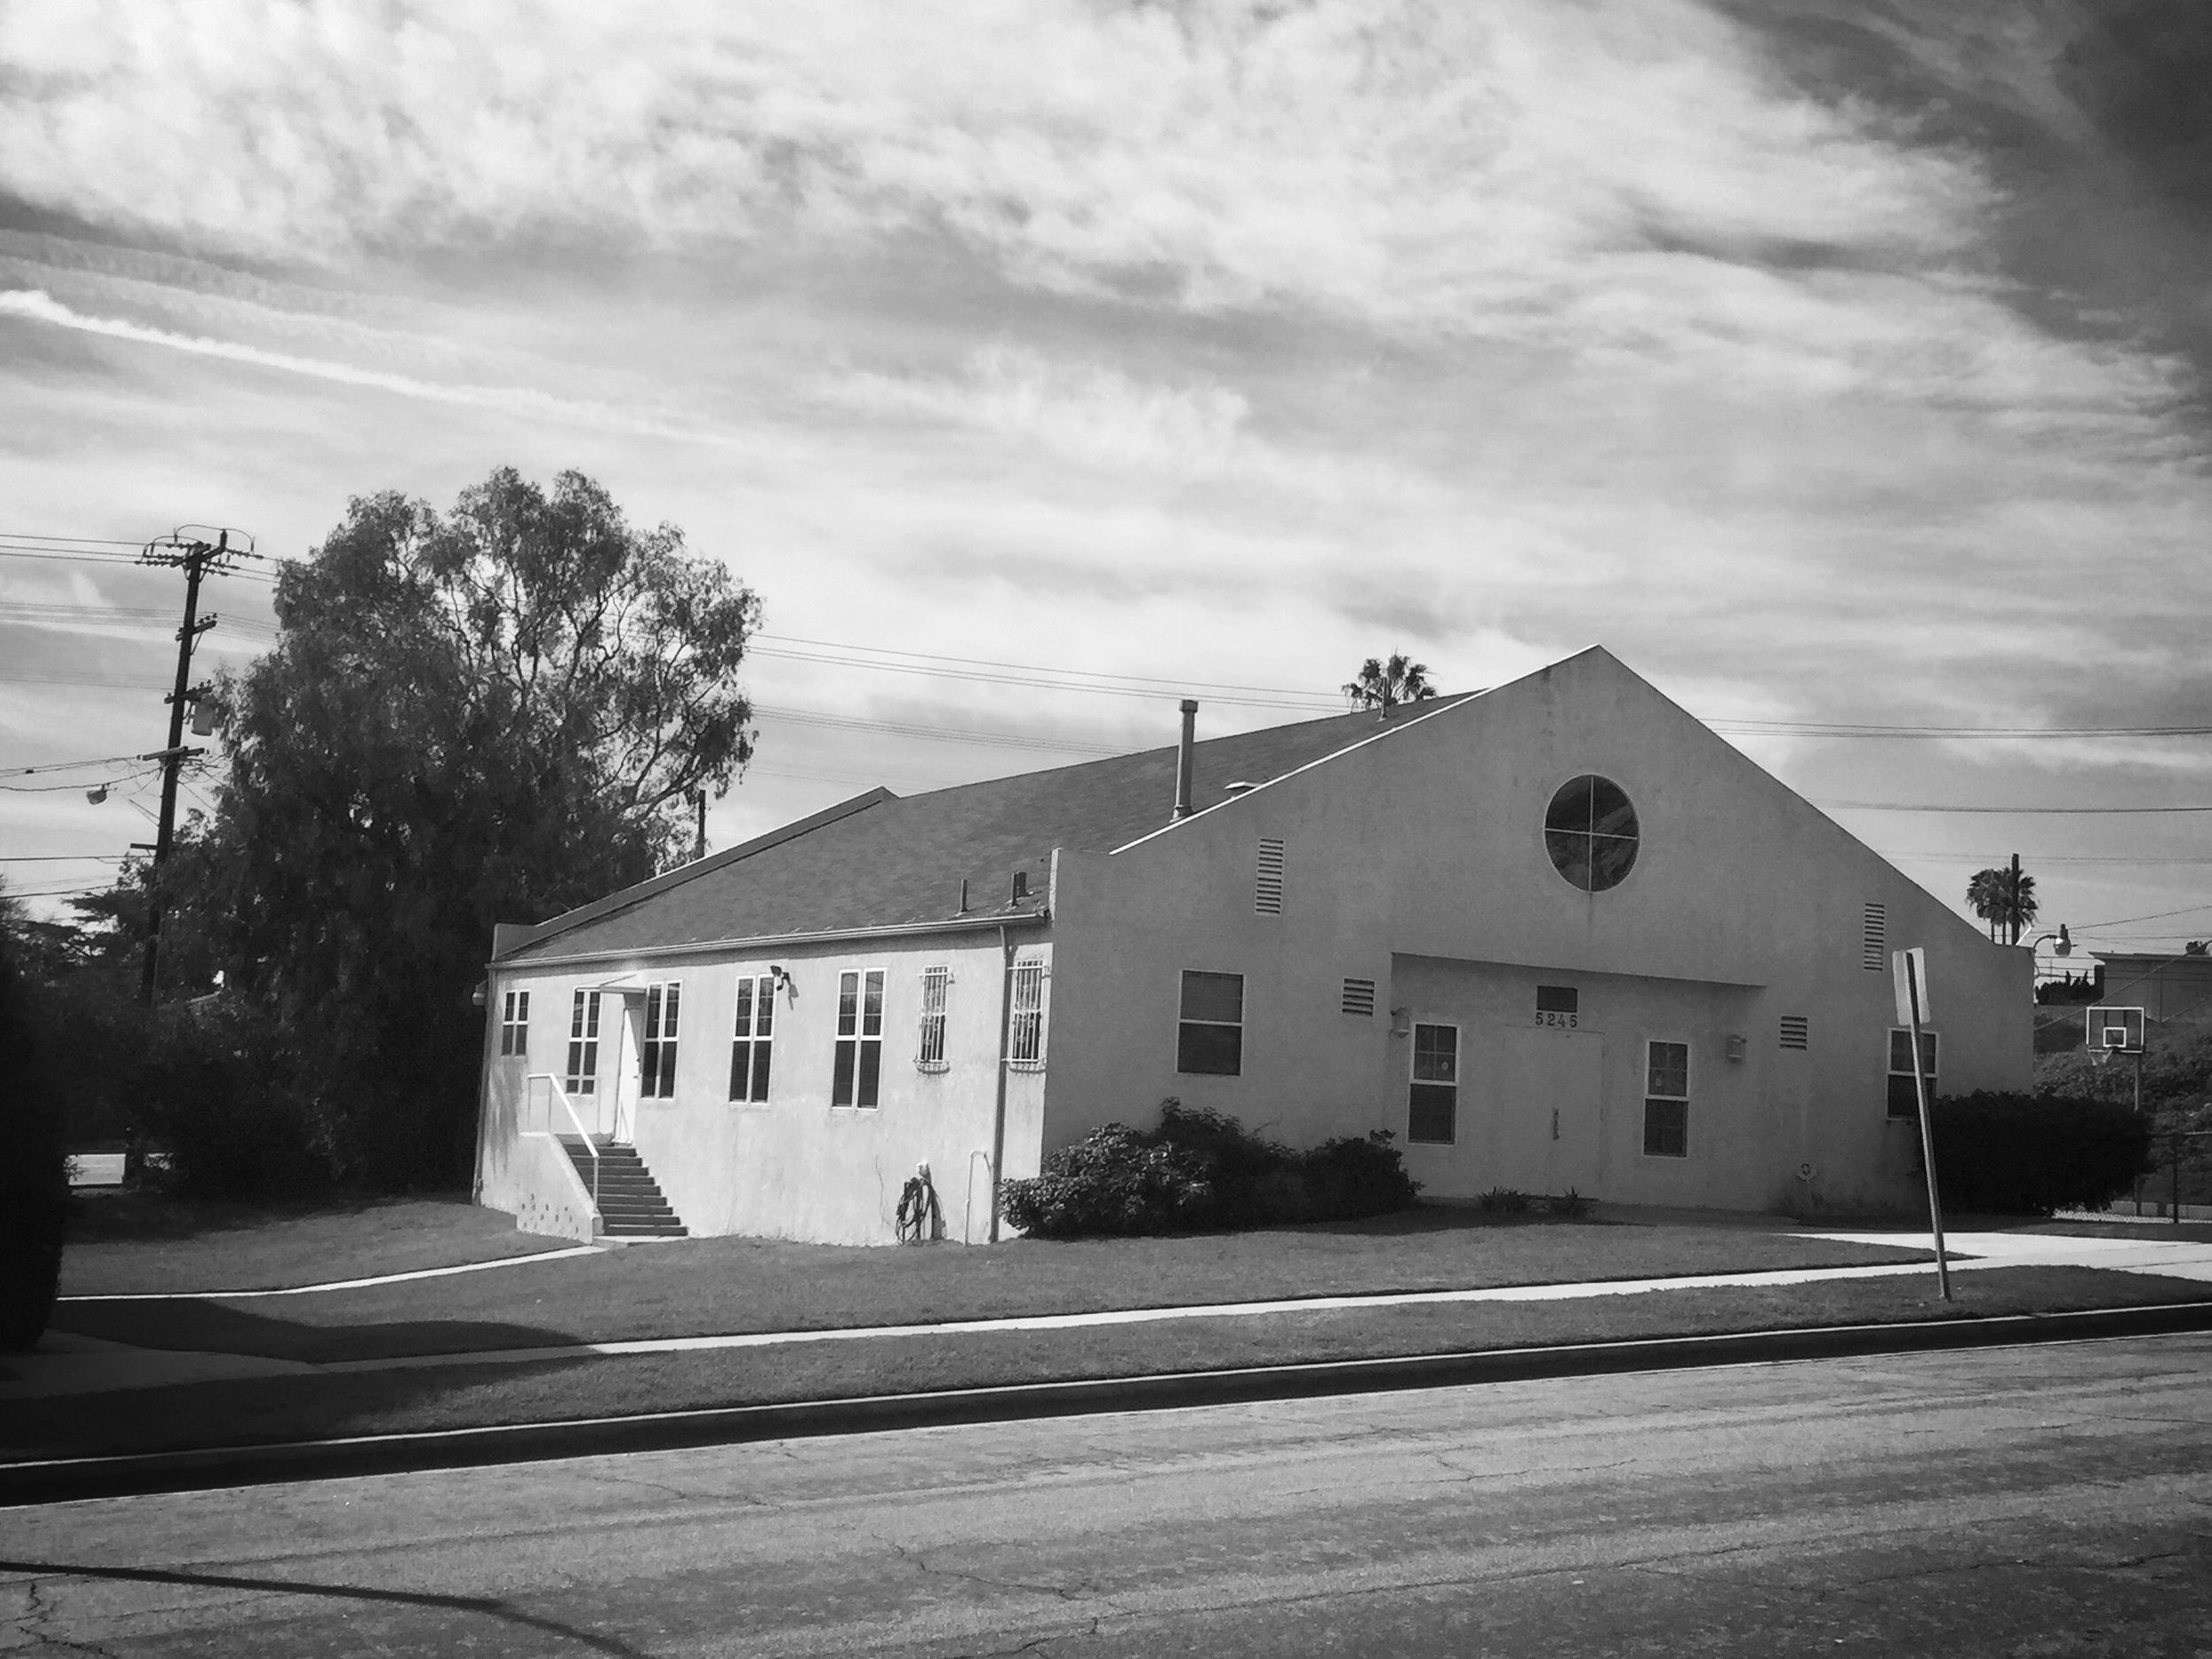 Fellowship Hall - Built 1951